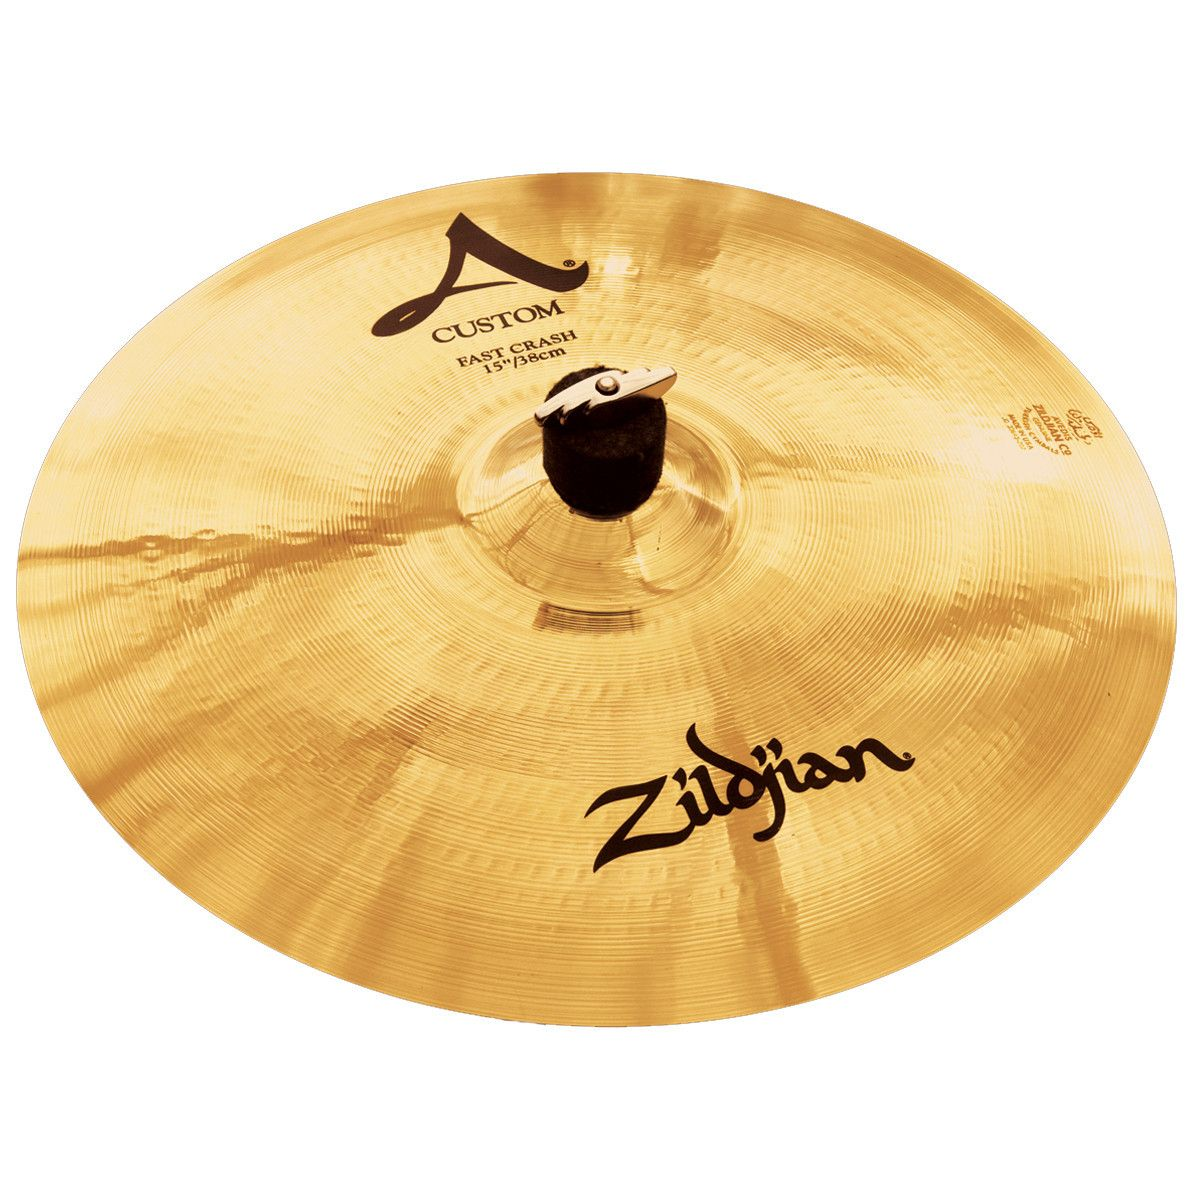 Zildjian A Custom Series 18 China Cymbal Brilliant finish